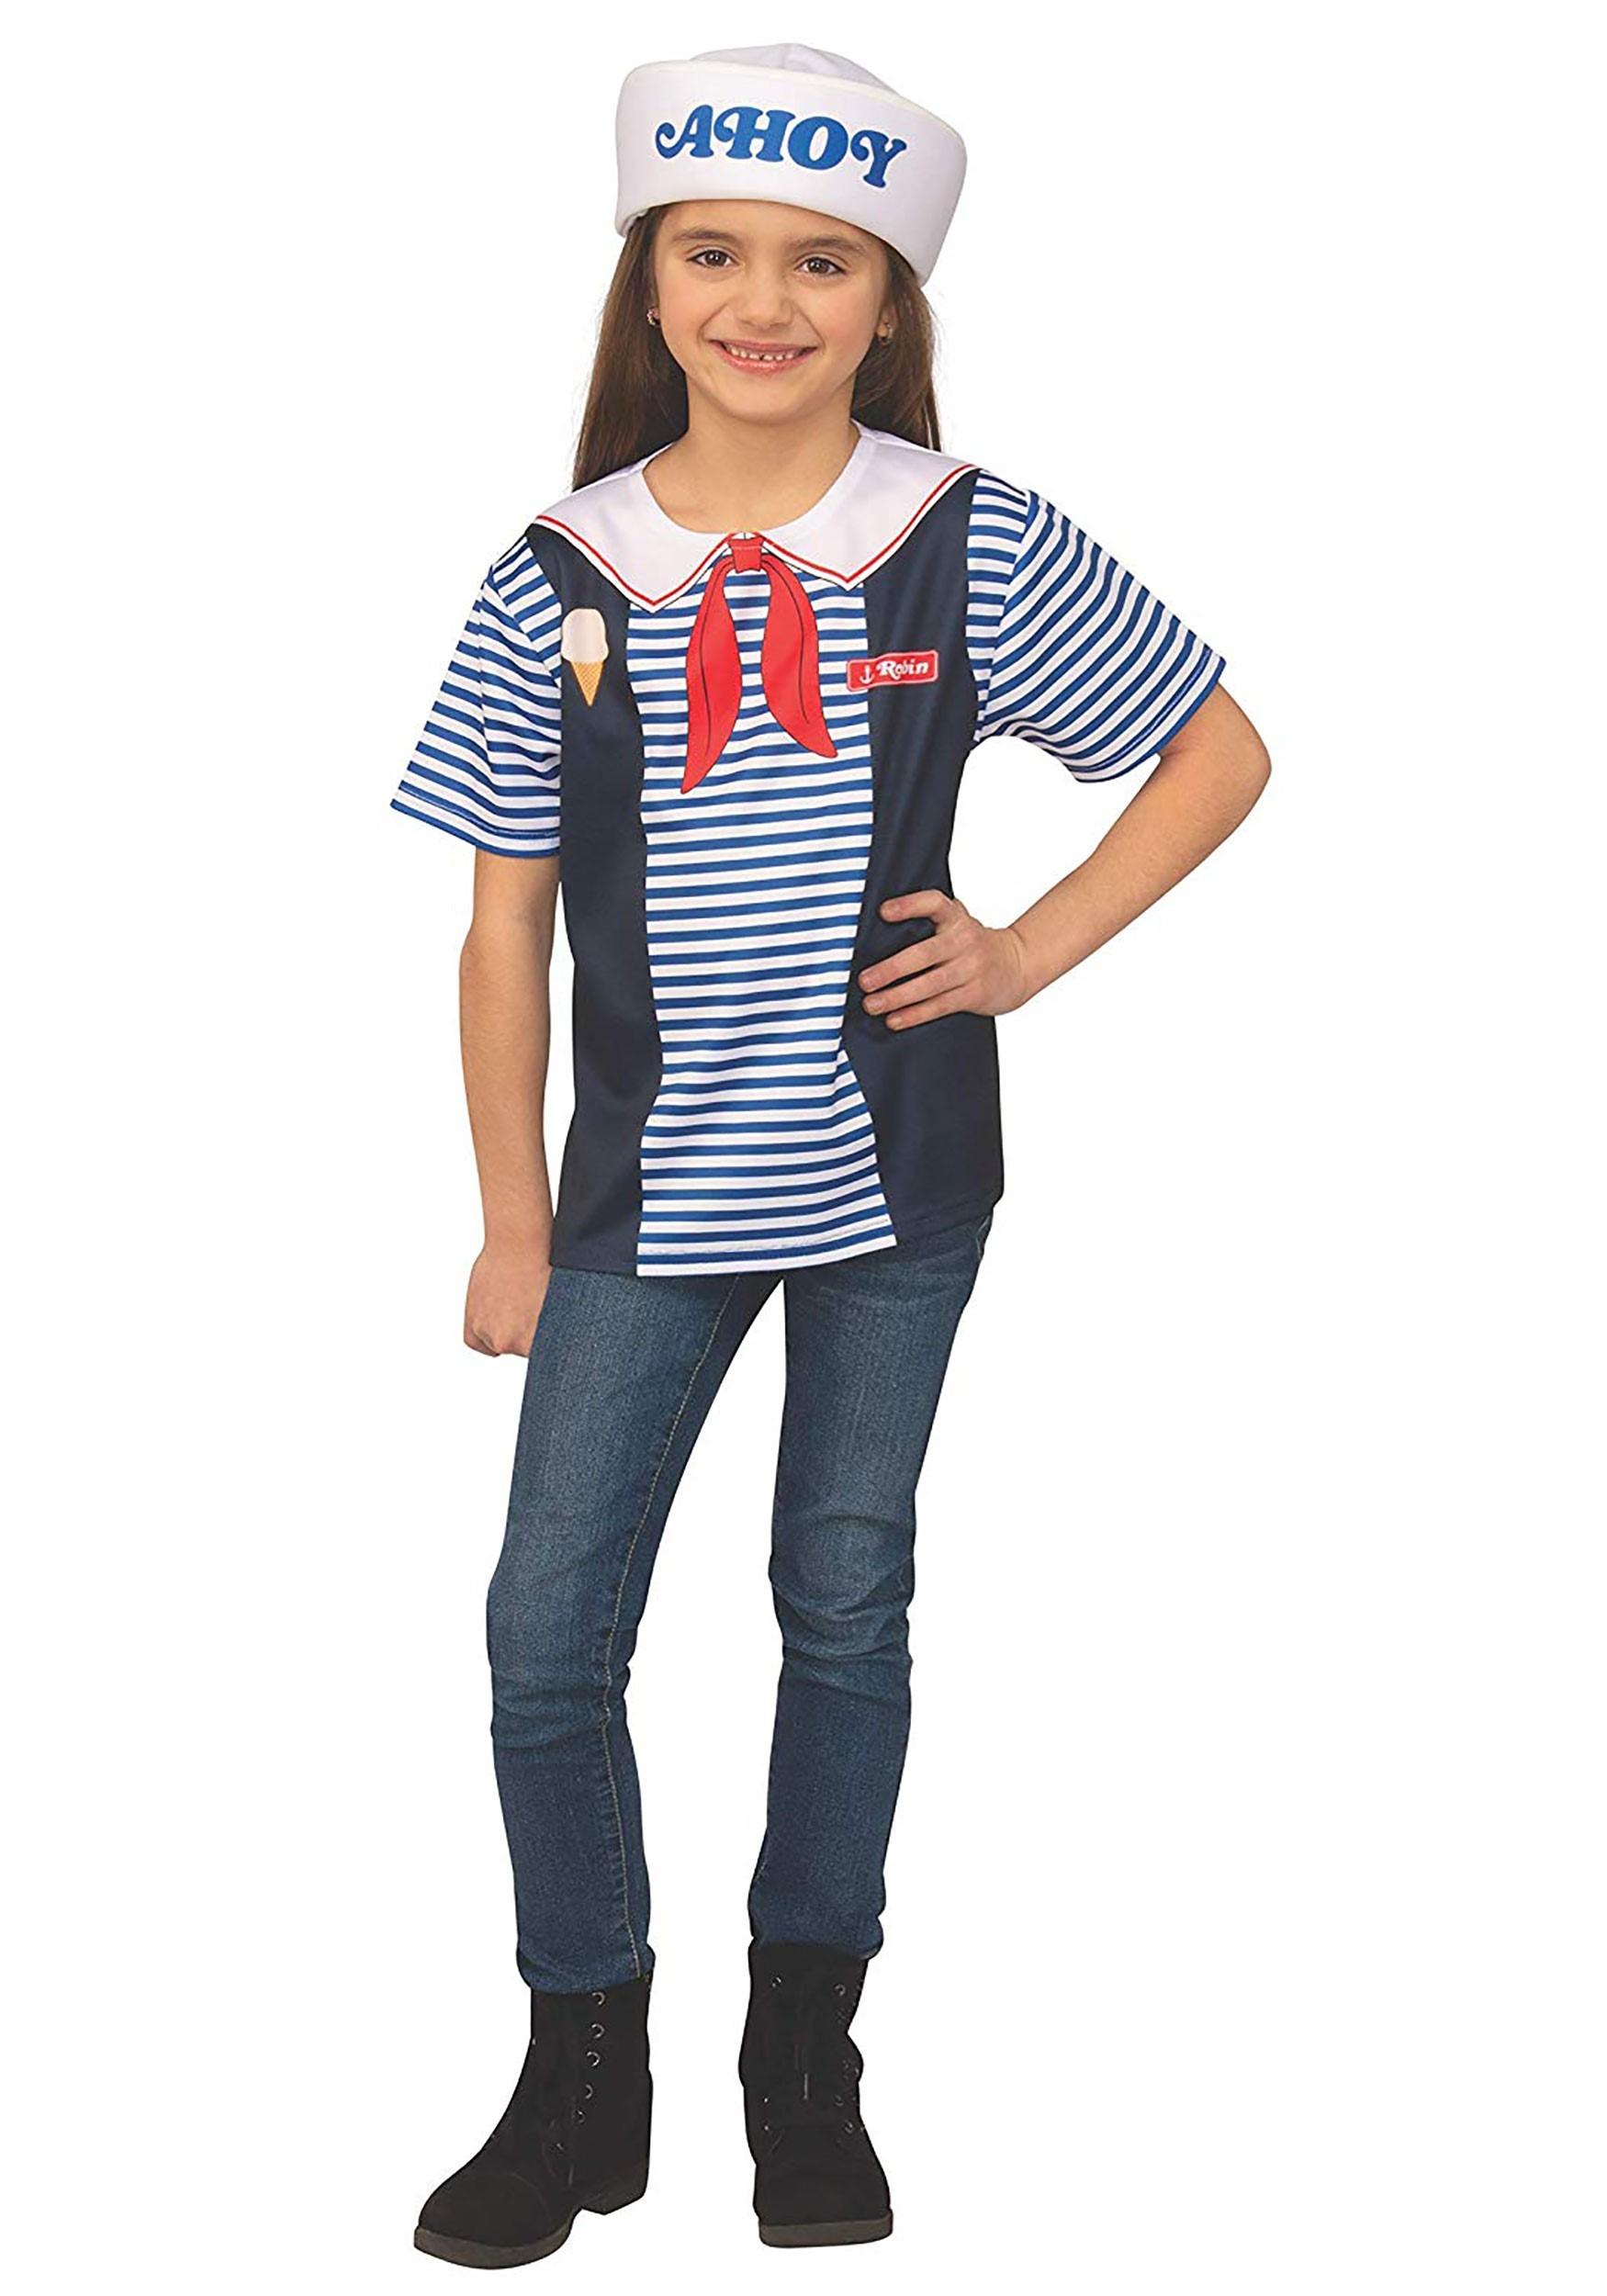 Stranger Things Robin's Scoops Ahoy Uniform Costume for Kids